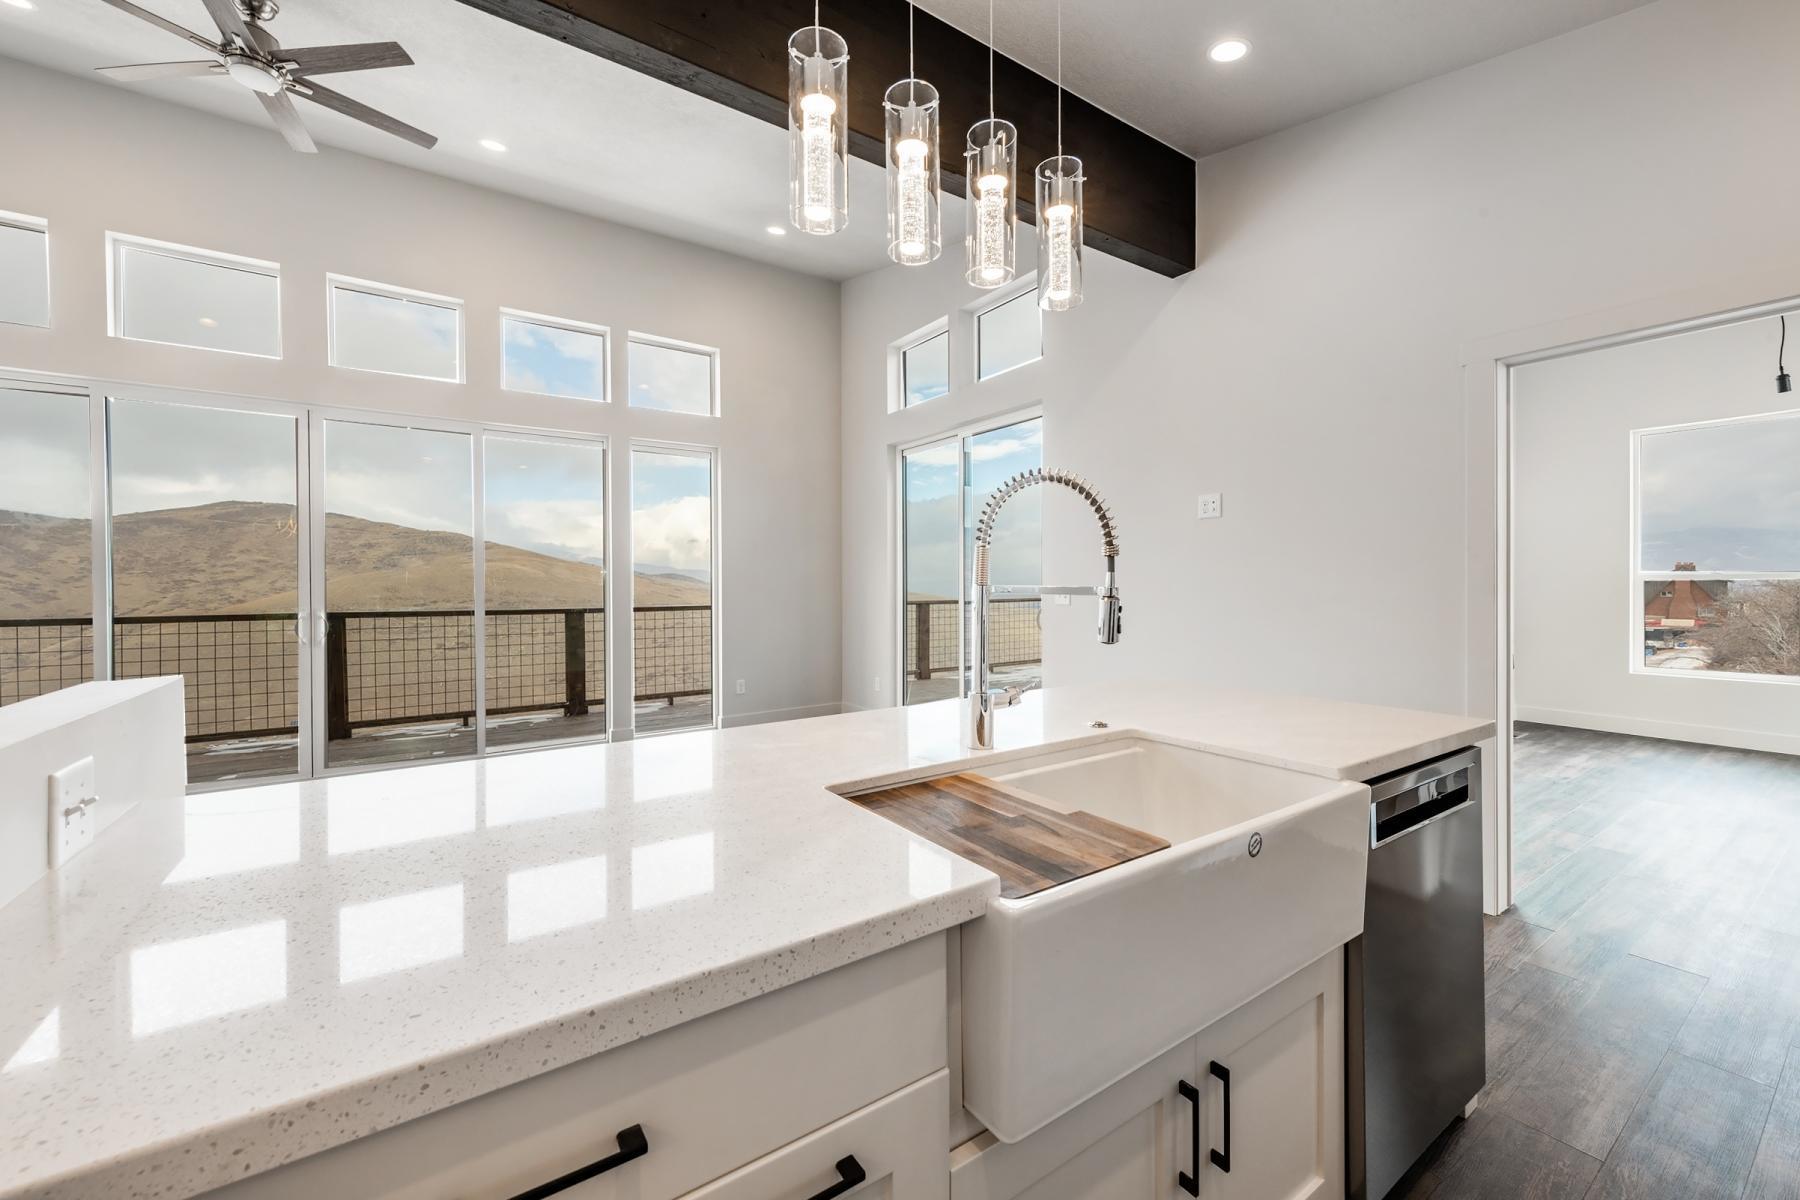 182 Valley View, Wanship, Utah 84017, 3 Bedrooms Bedrooms, ,3 BathroomsBathrooms,Single Family,For Sale,Valley,12101375